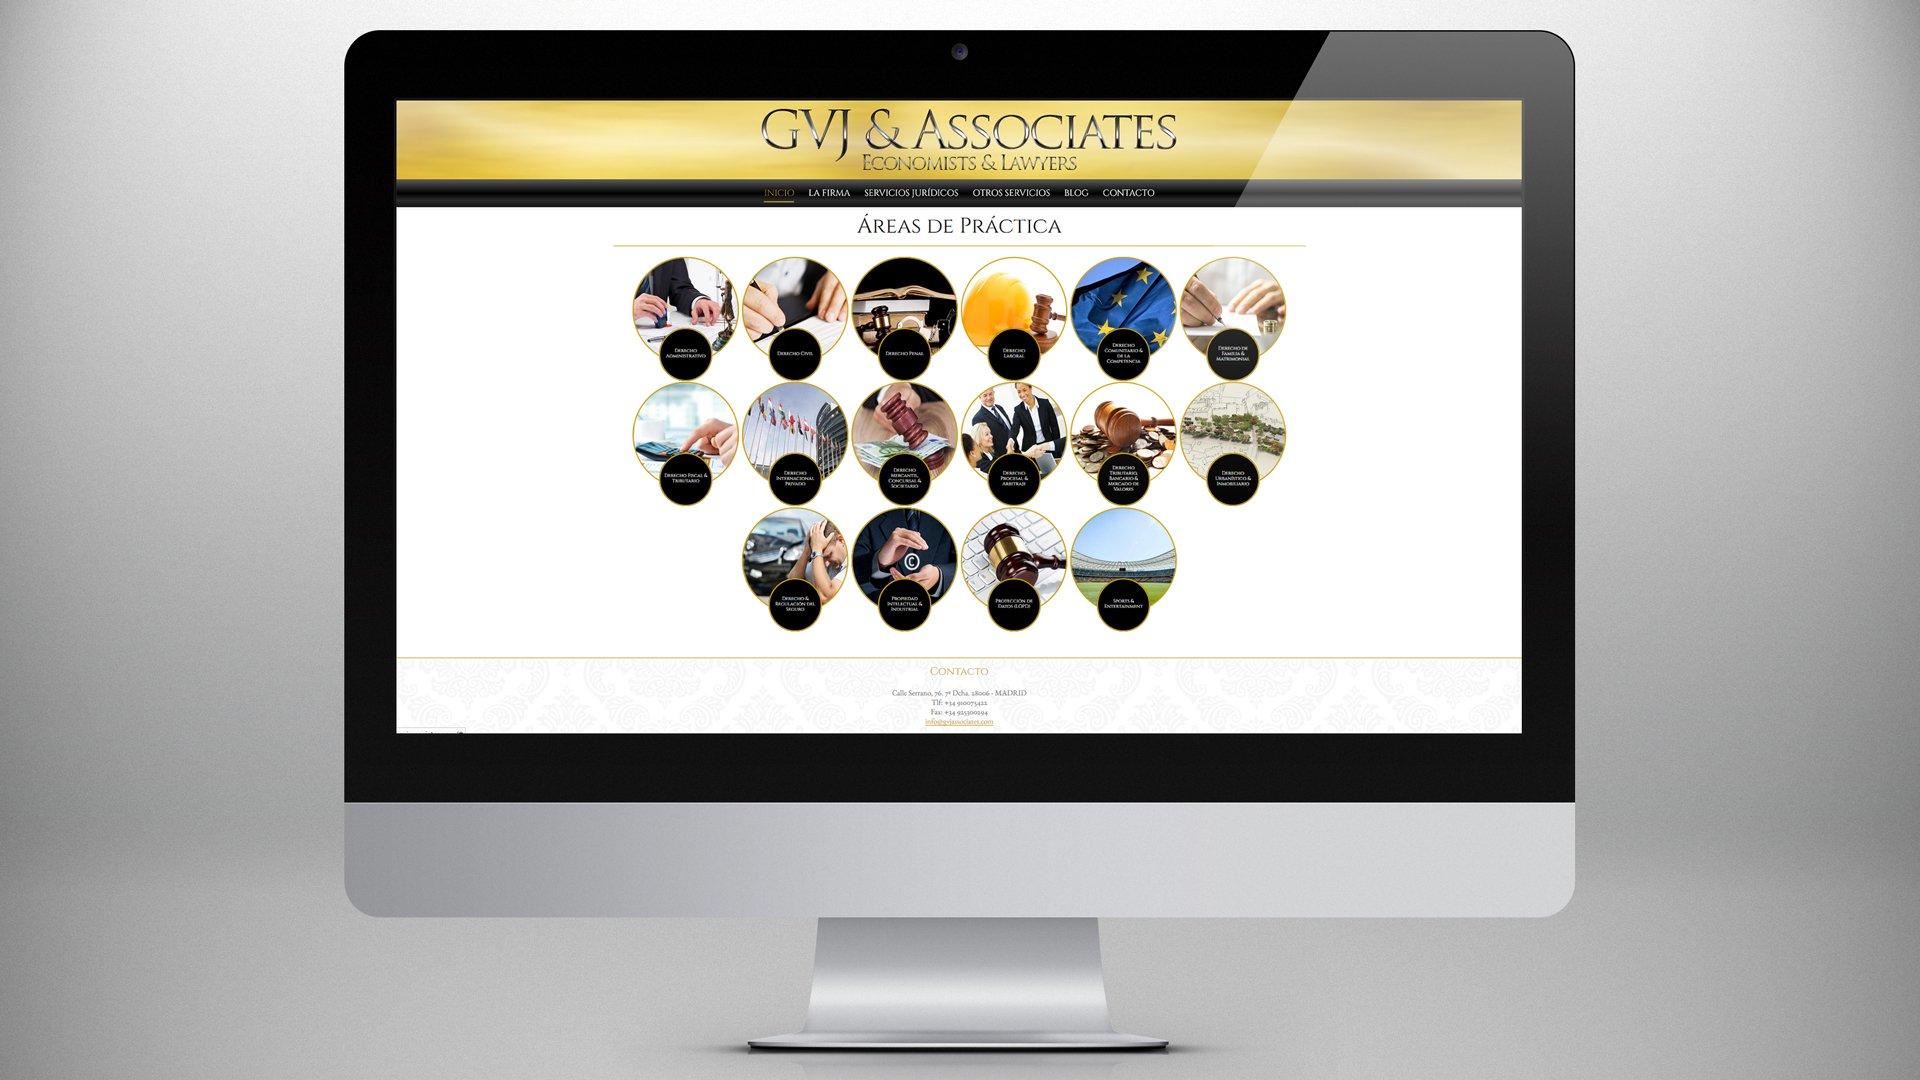 GVJ Associates